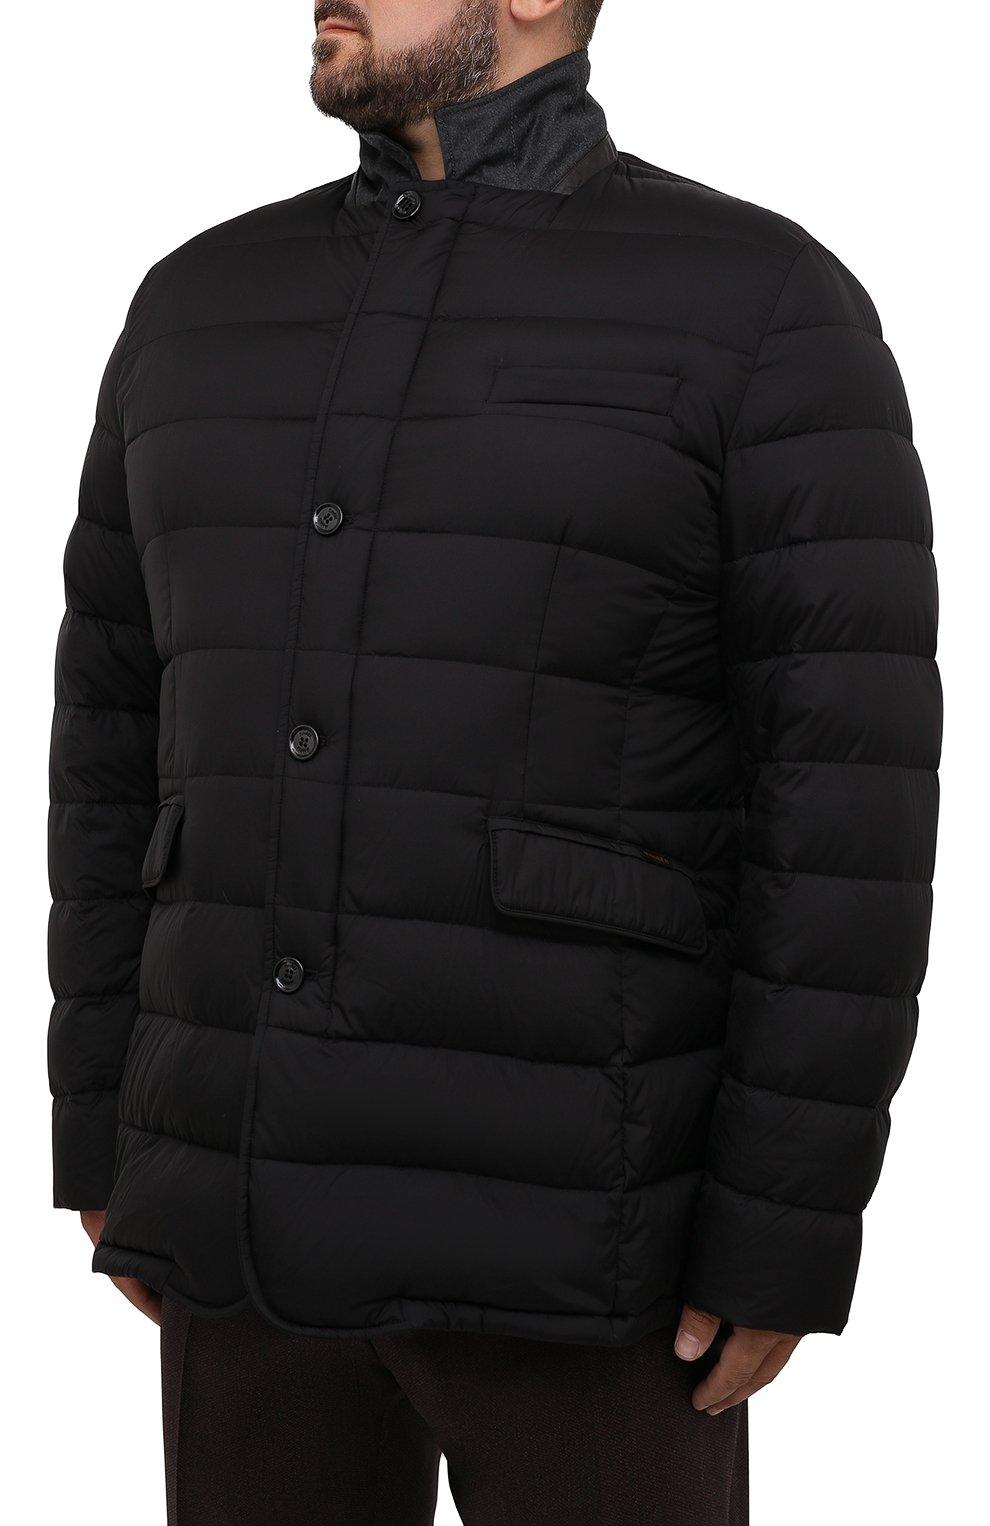 Мужская пуховая куртка zayn-op MOORER черного цвета, арт. ZAYN-0P/M0UGI100307-TEPA017/60-68   Фото 3 (Кросс-КТ: Куртка, Пуховик; Мужское Кросс-КТ: пуховик-короткий; Рукава: Длинные; Материал внешний: Синтетический материал; Стили: Классический; Материал подклада: Синтетический материал)